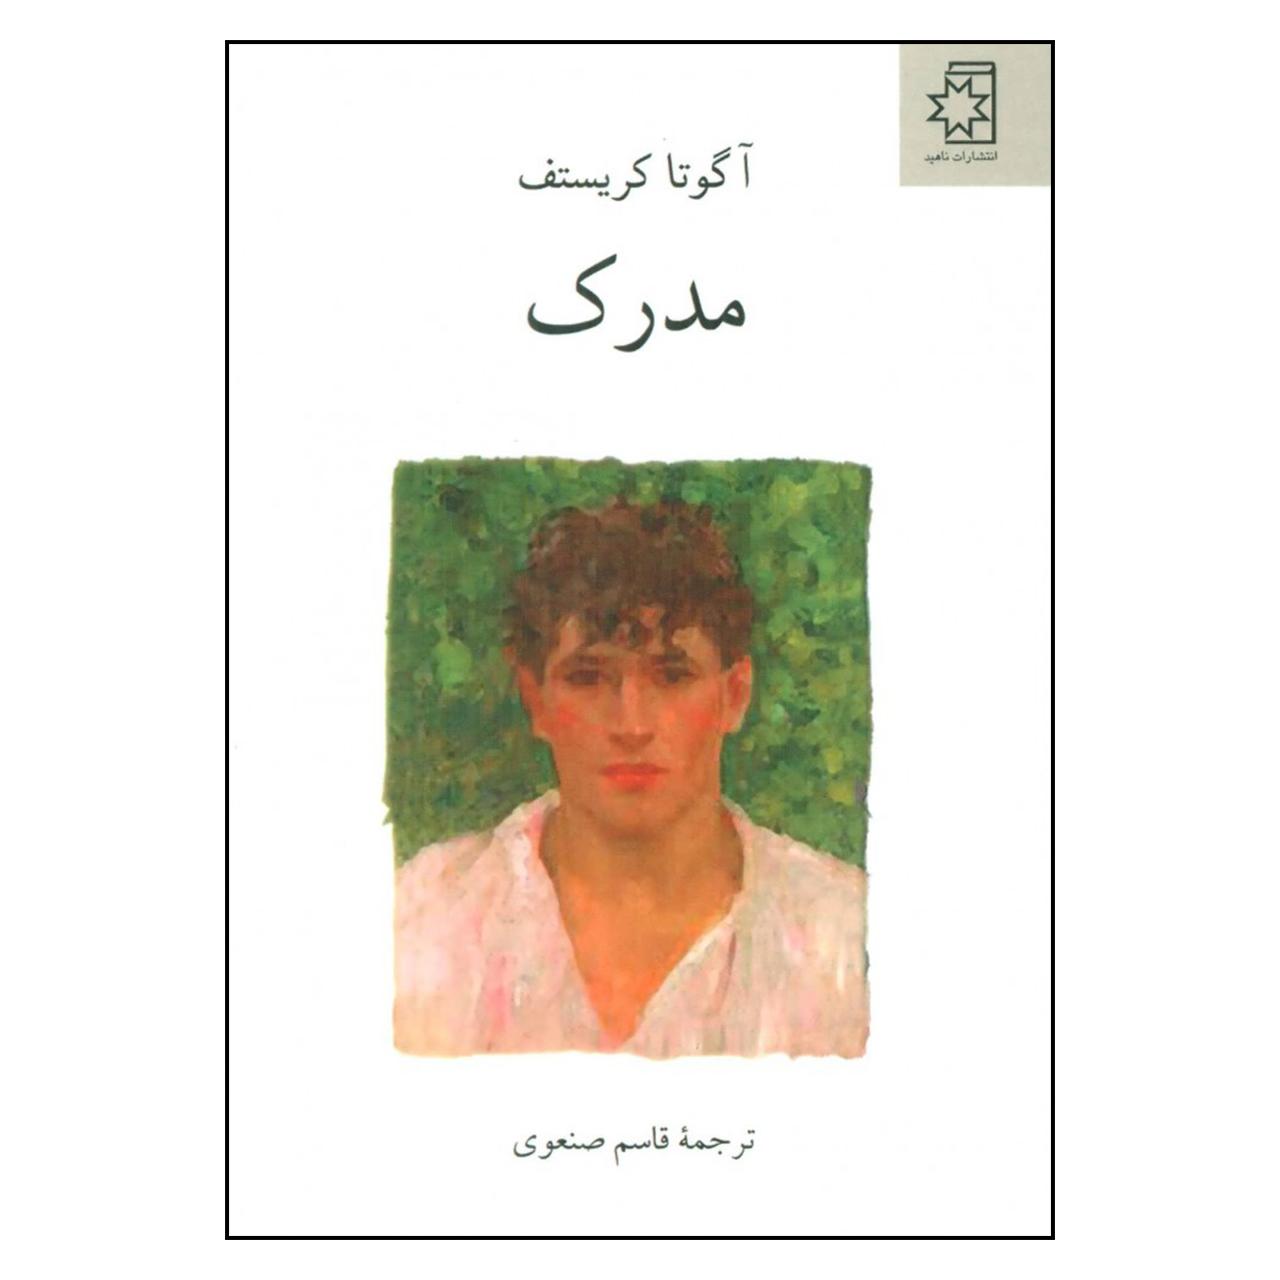 کتاب مدرک اثر آگوتا کریستف انتشارات ناهید